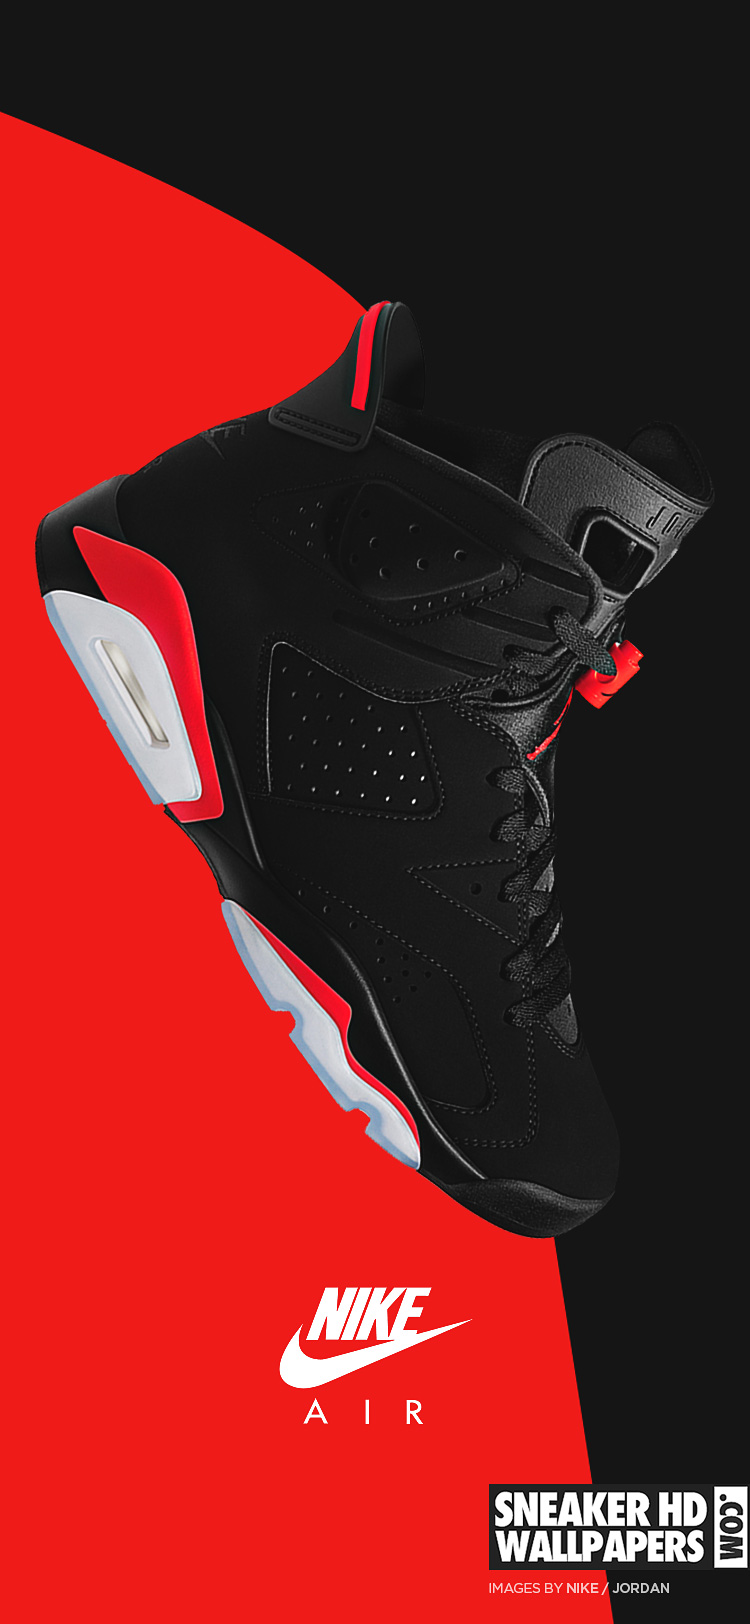 Jordan Shoe Wallpaper Iphone - 750x1624